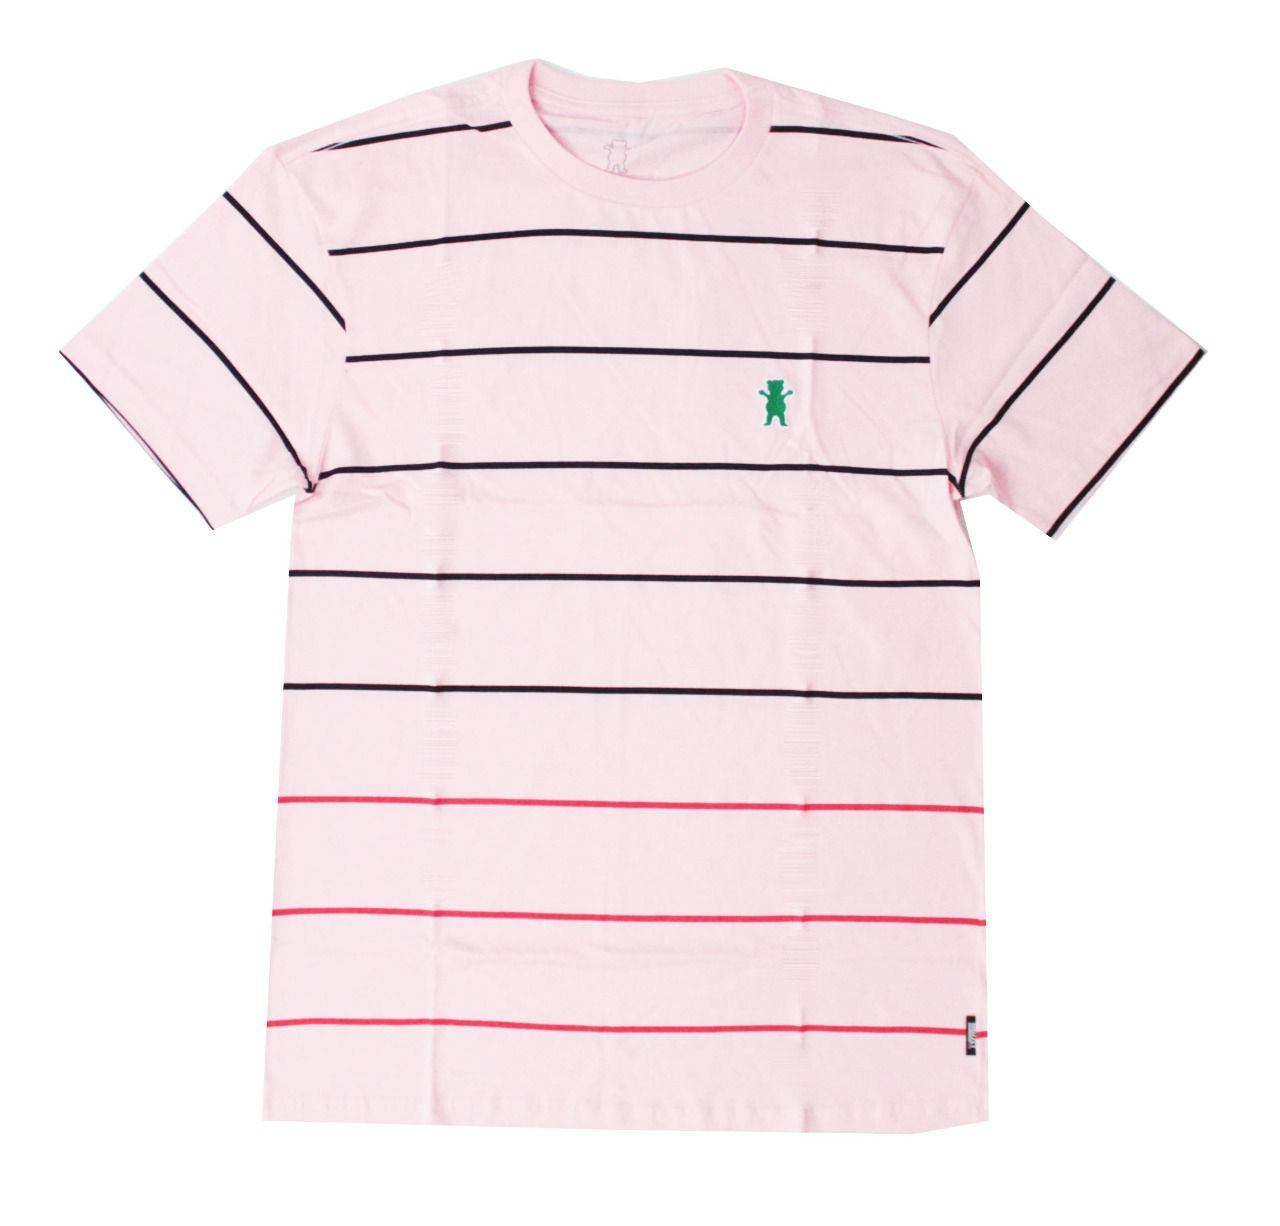 Camiseta Grizzly Saguaro Tee Rosa